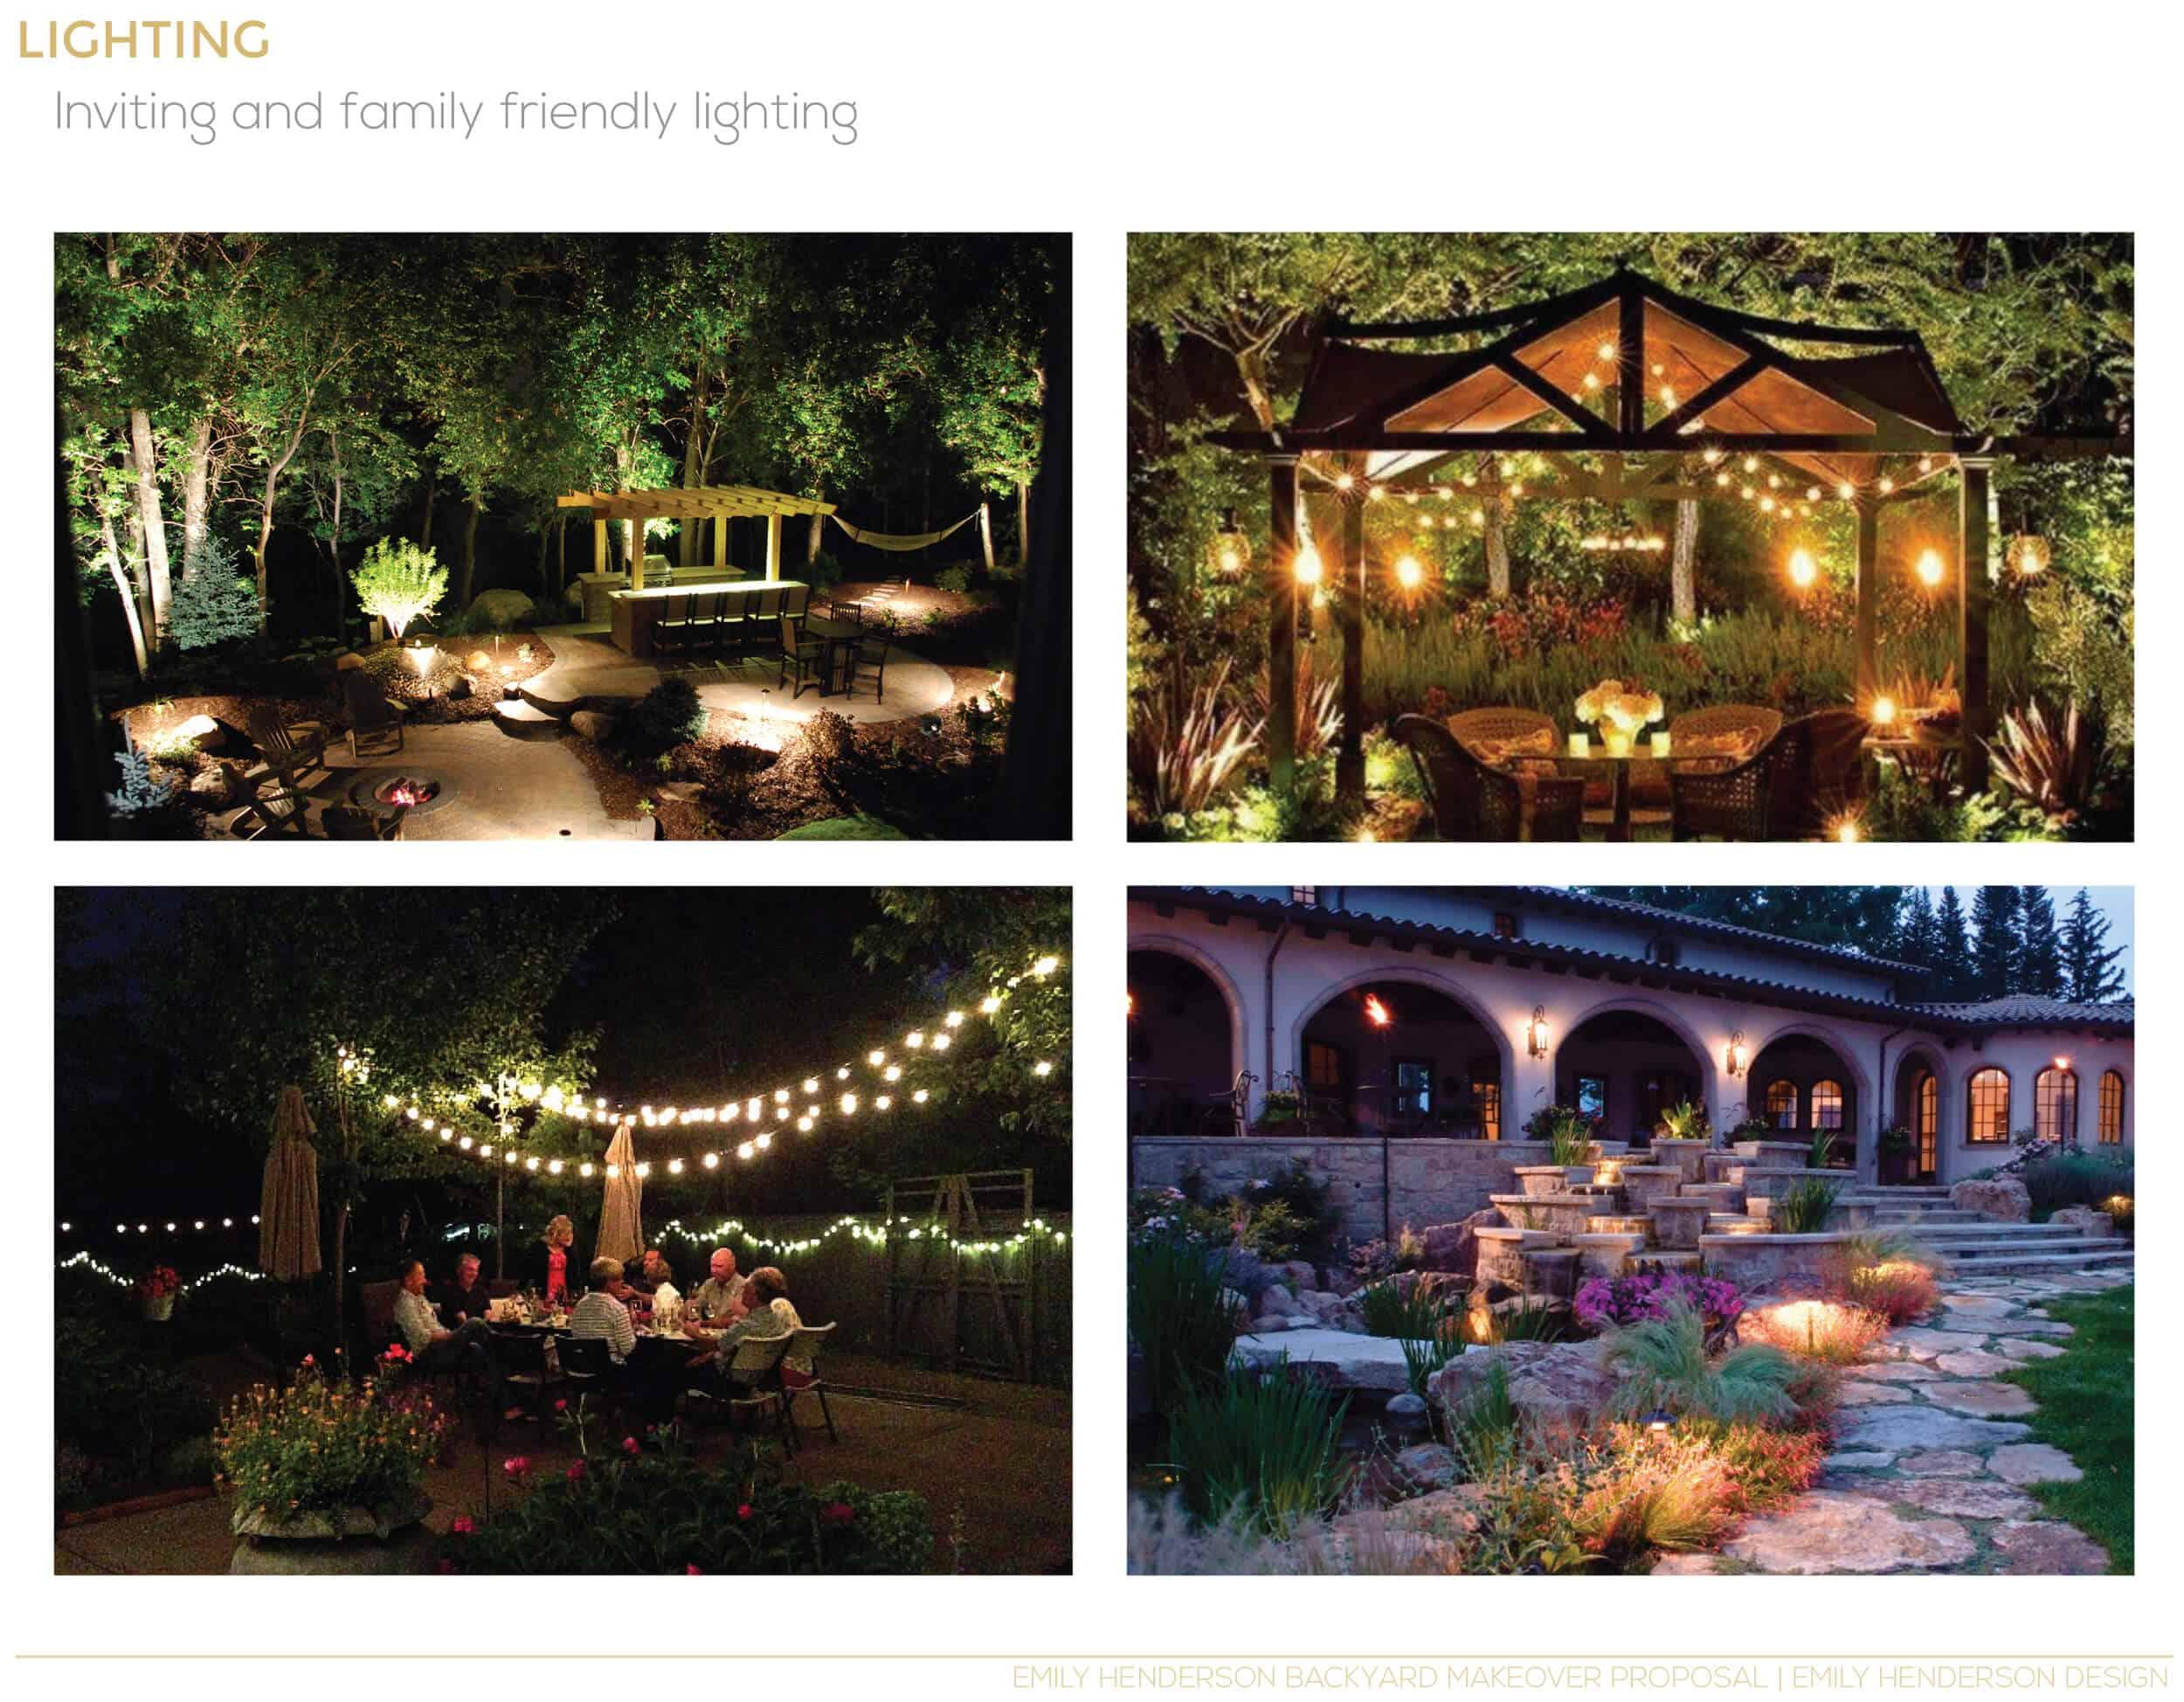 emily-henderson_waverly_backyard-makeover-proposal_2016-17